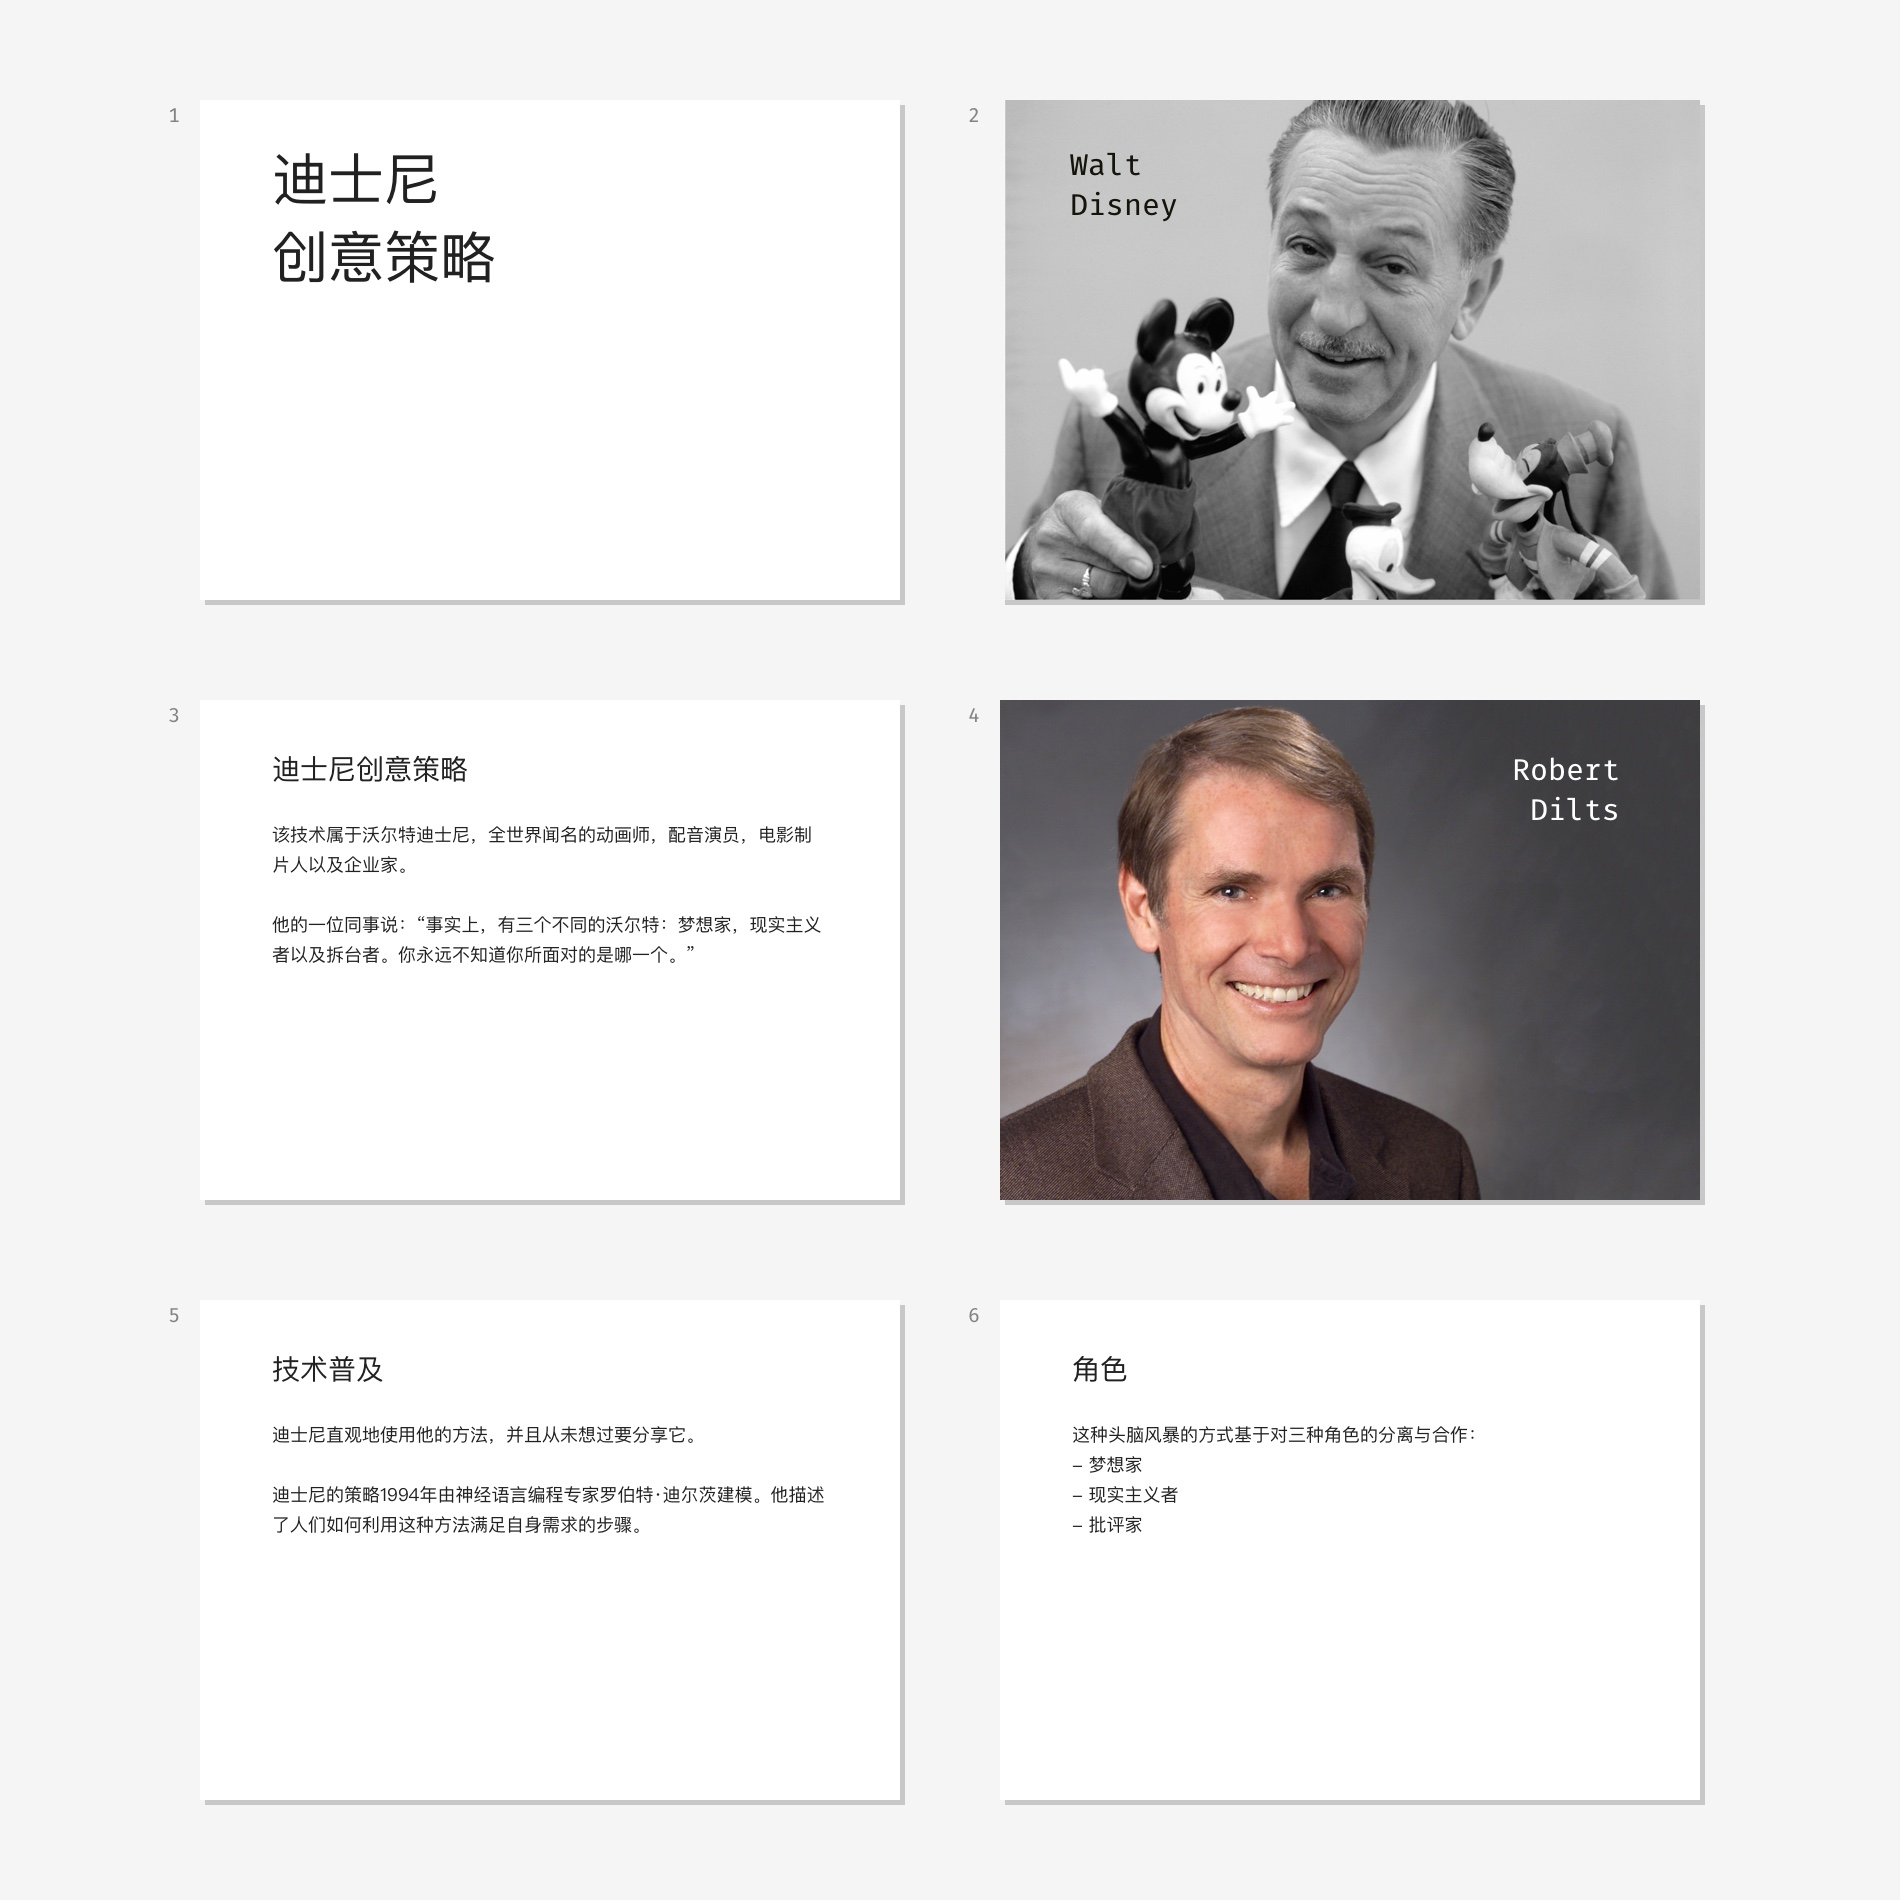 brainstorming-workshops-09_cn